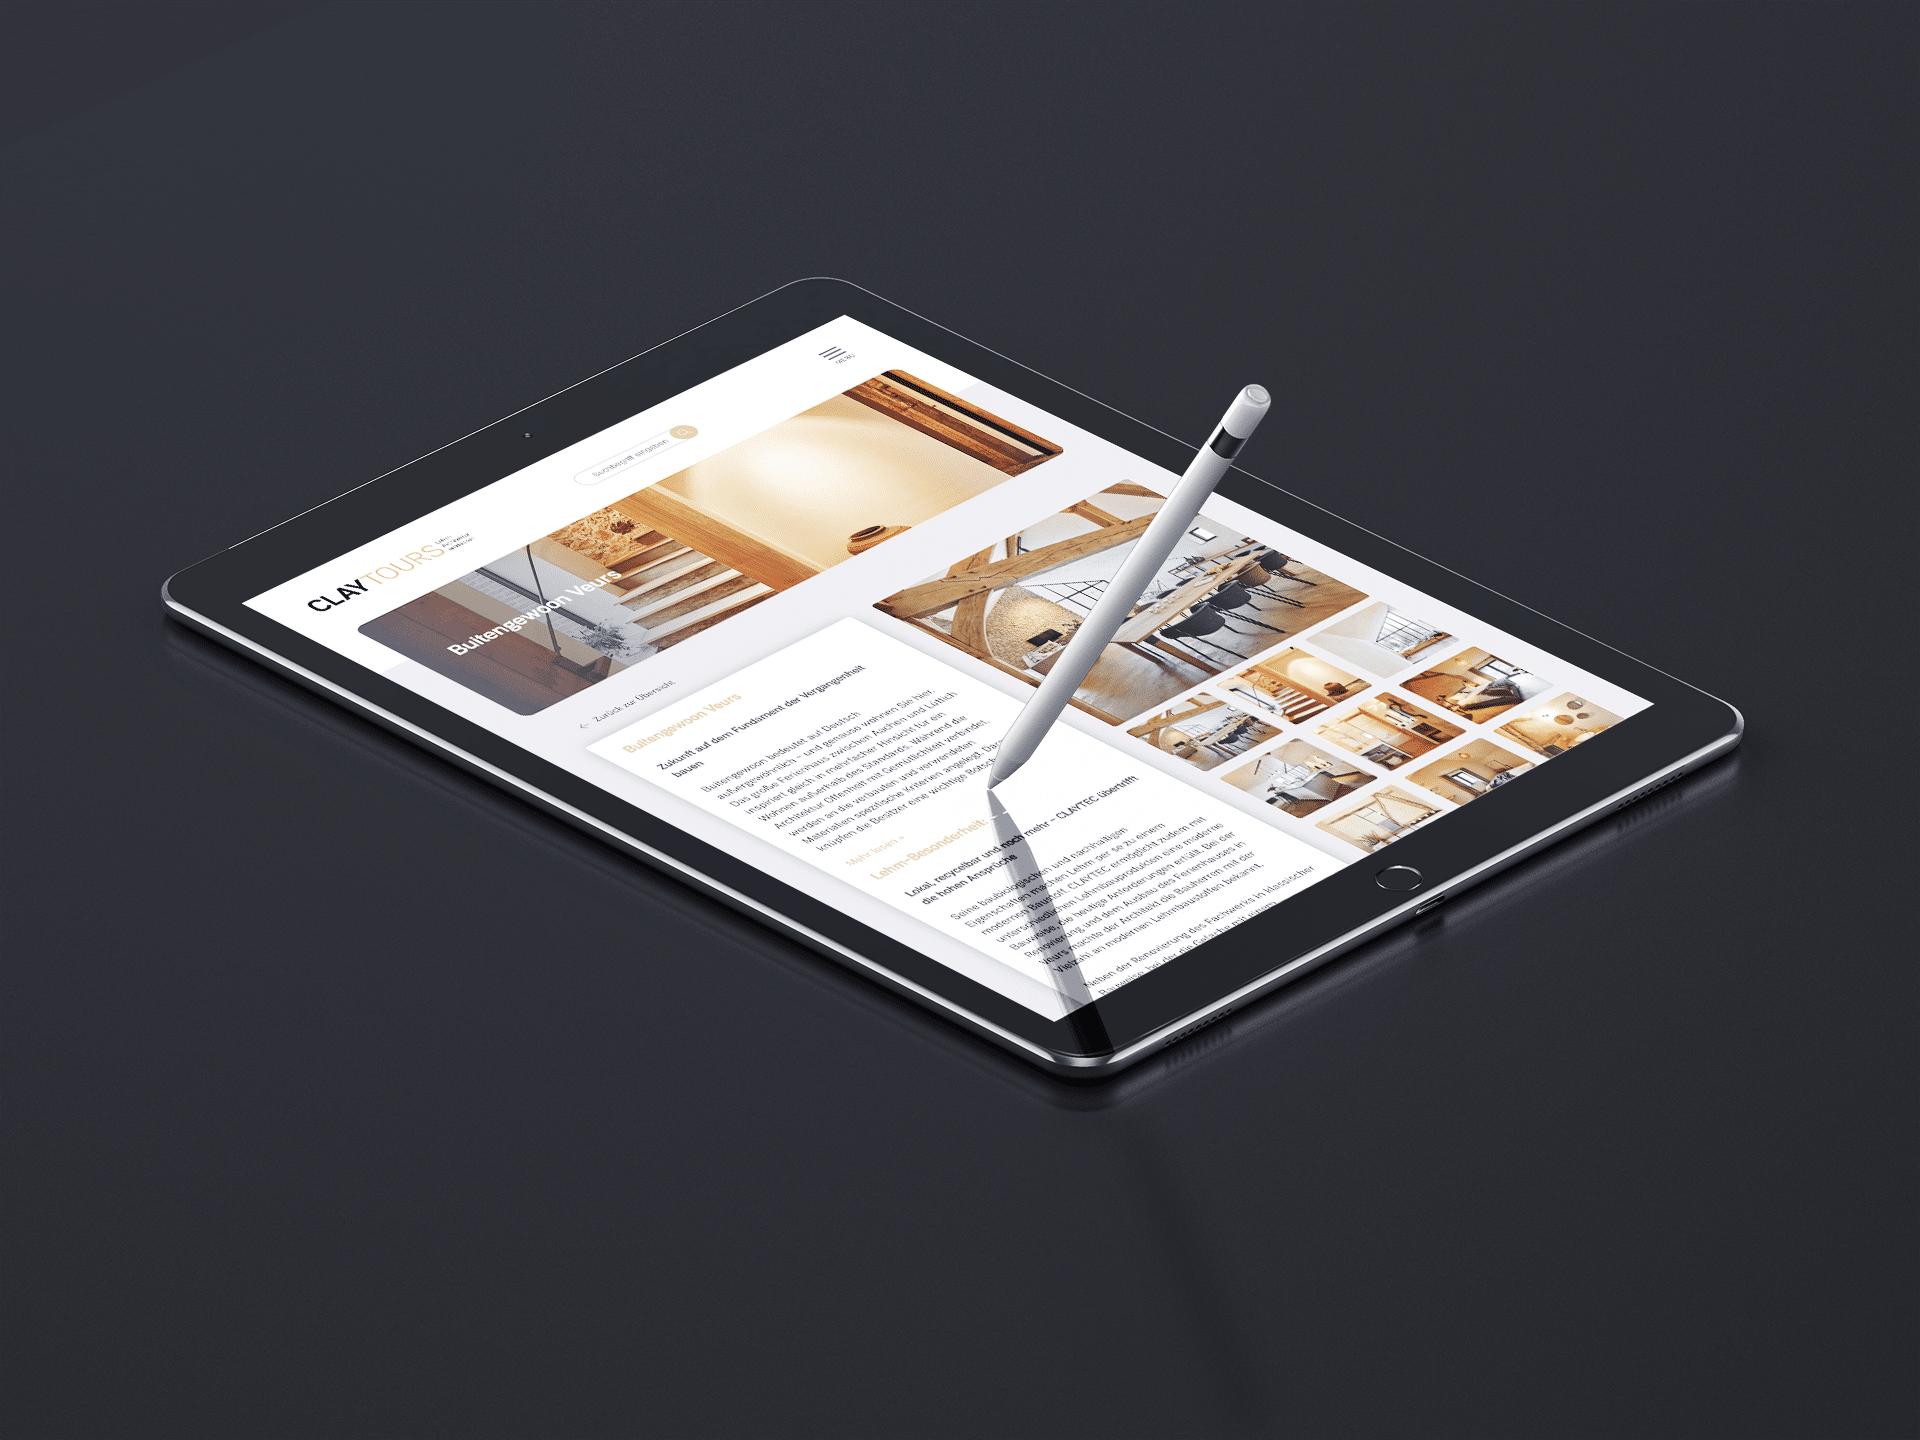 Claytours Webseite iPad